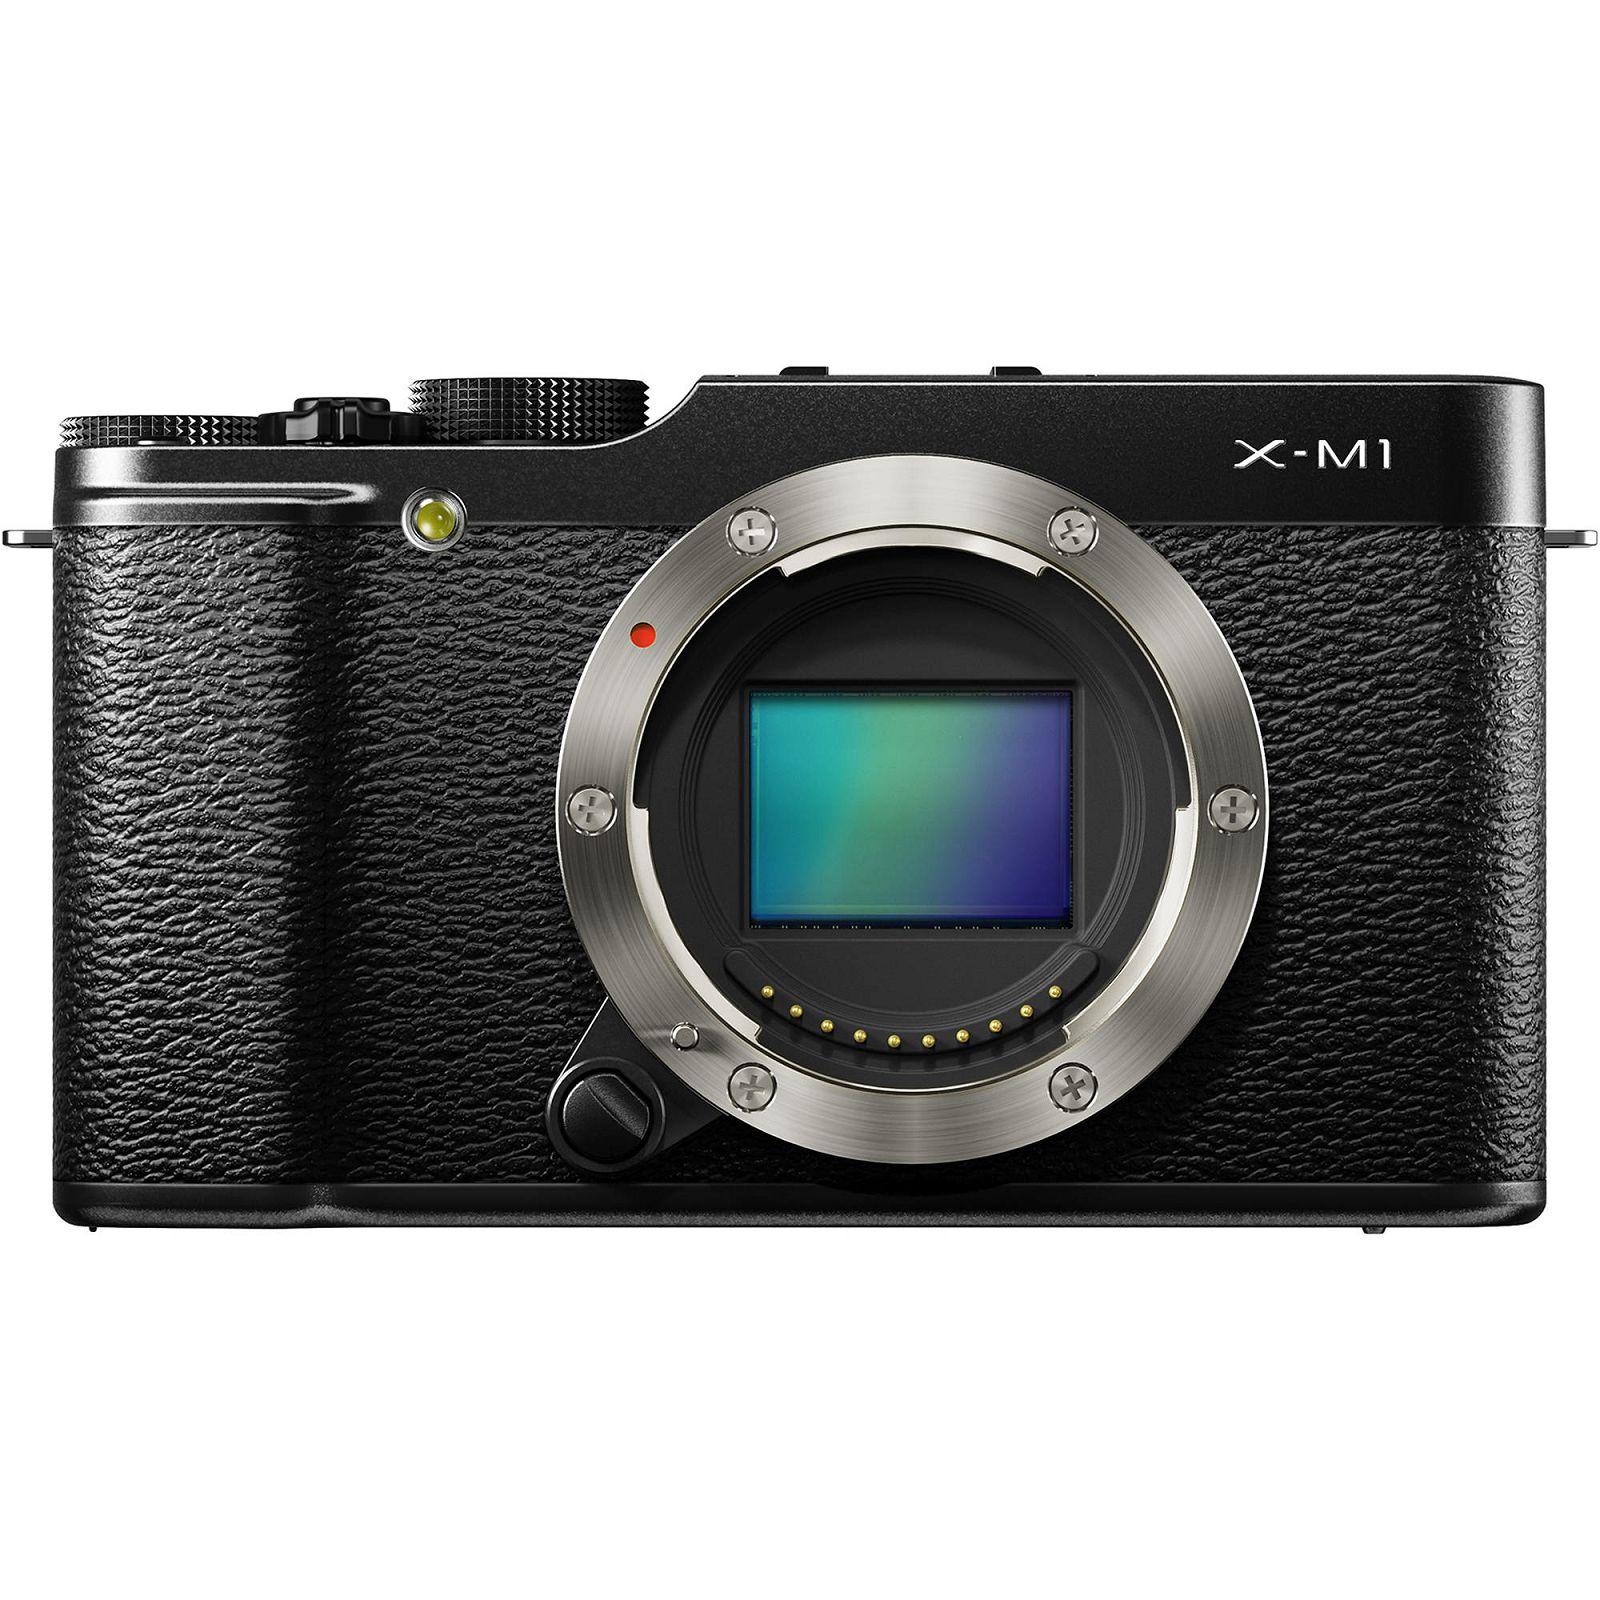 Fujifilm X-M1 Body Digitalni fotoaparat Mirrorless camera Fuji Finepix XM1 16MP APS- Trans CMOS II, 3.0